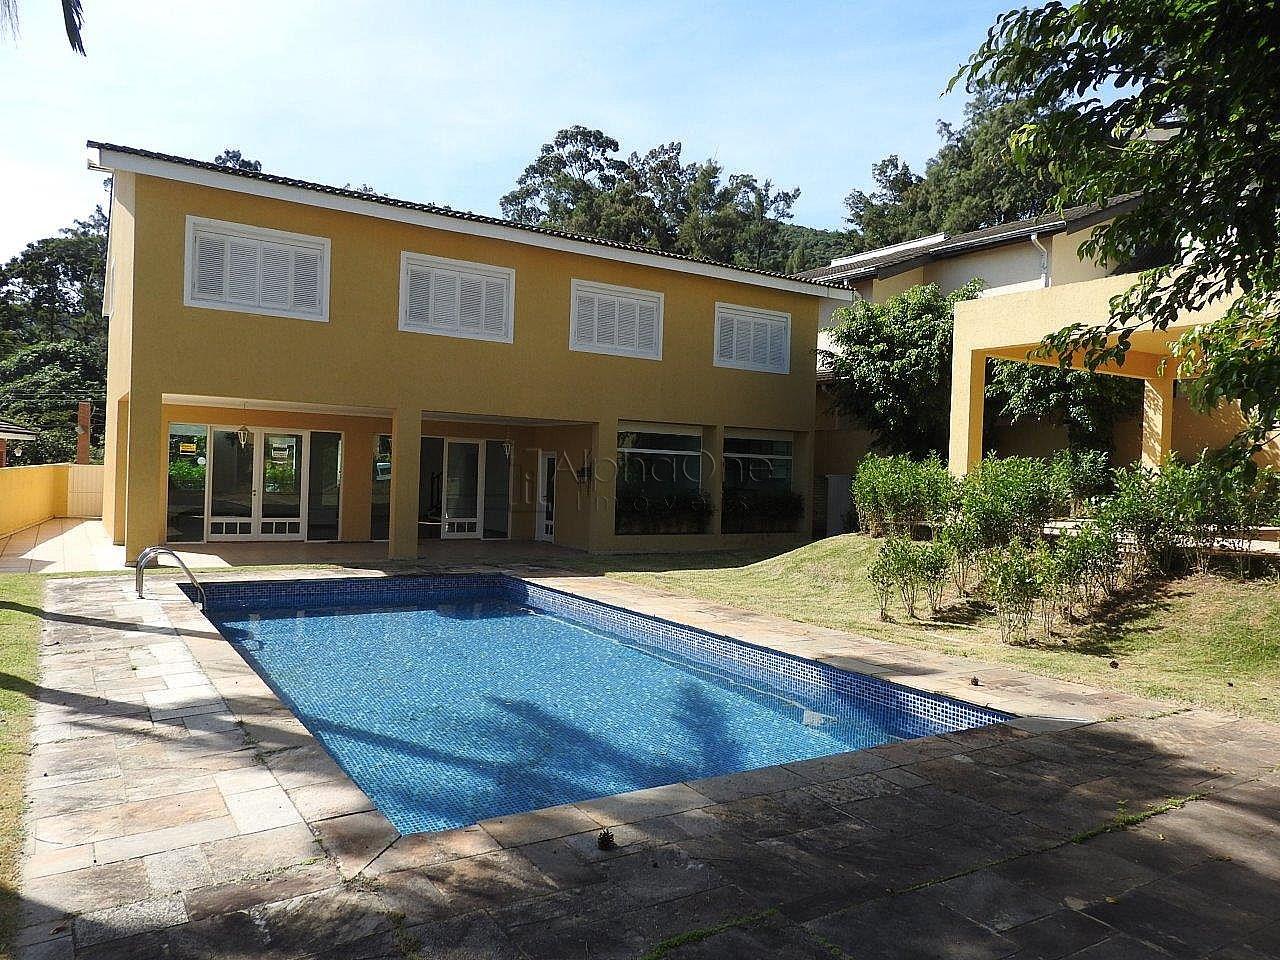 Casa em Condomínio Alphaville 10, Santana de Parnaíba (1740)